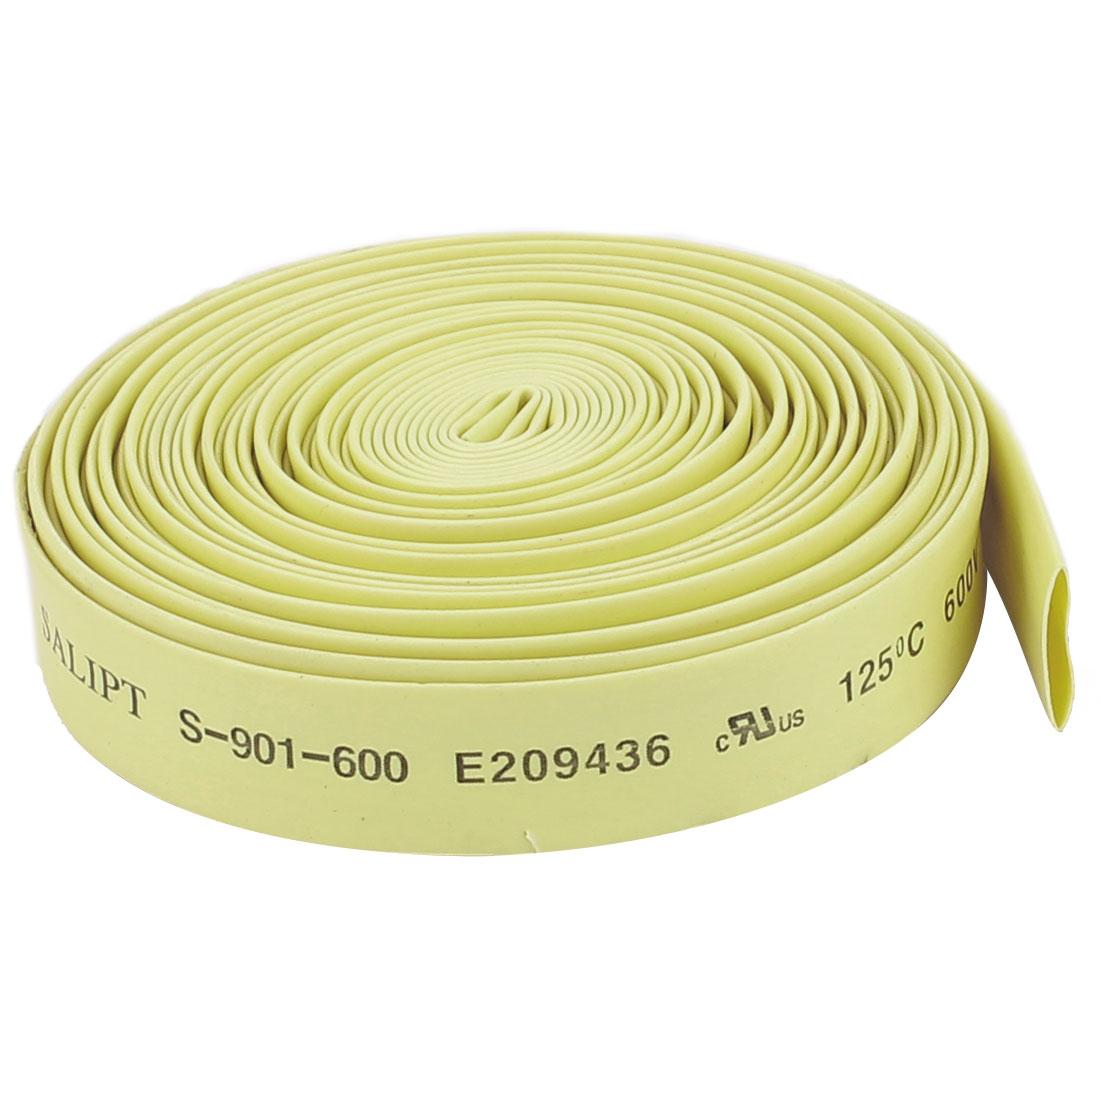 Yellow 8mm Dia 2:1 Polyolefin Heat Shrink Tubing Shrinkable Tube 5M 16.4Ft